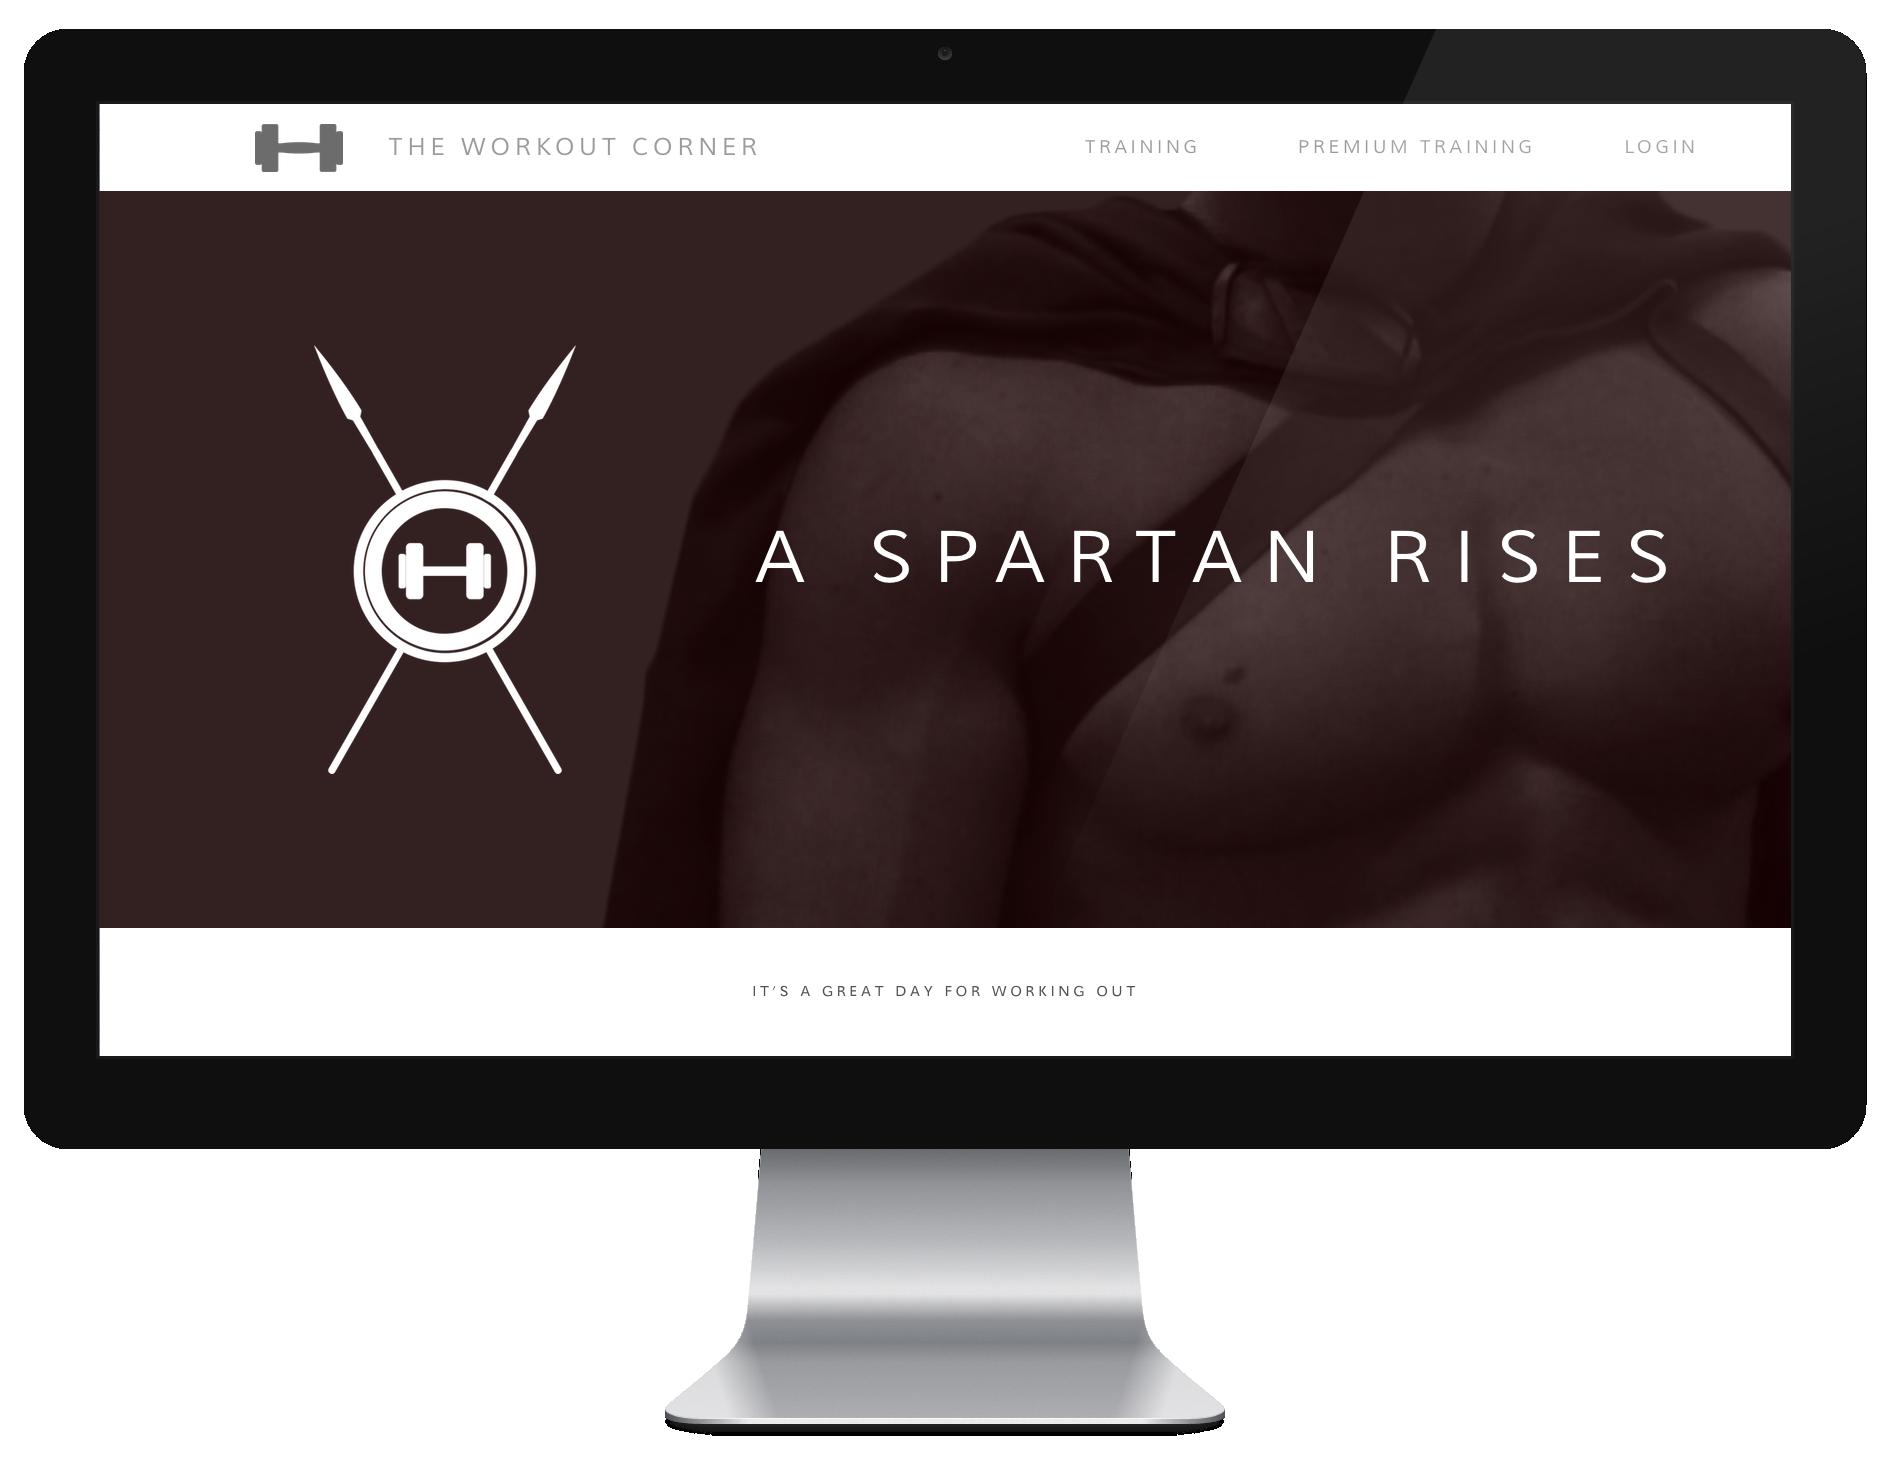 Workout Corner A Spartan Rises.png